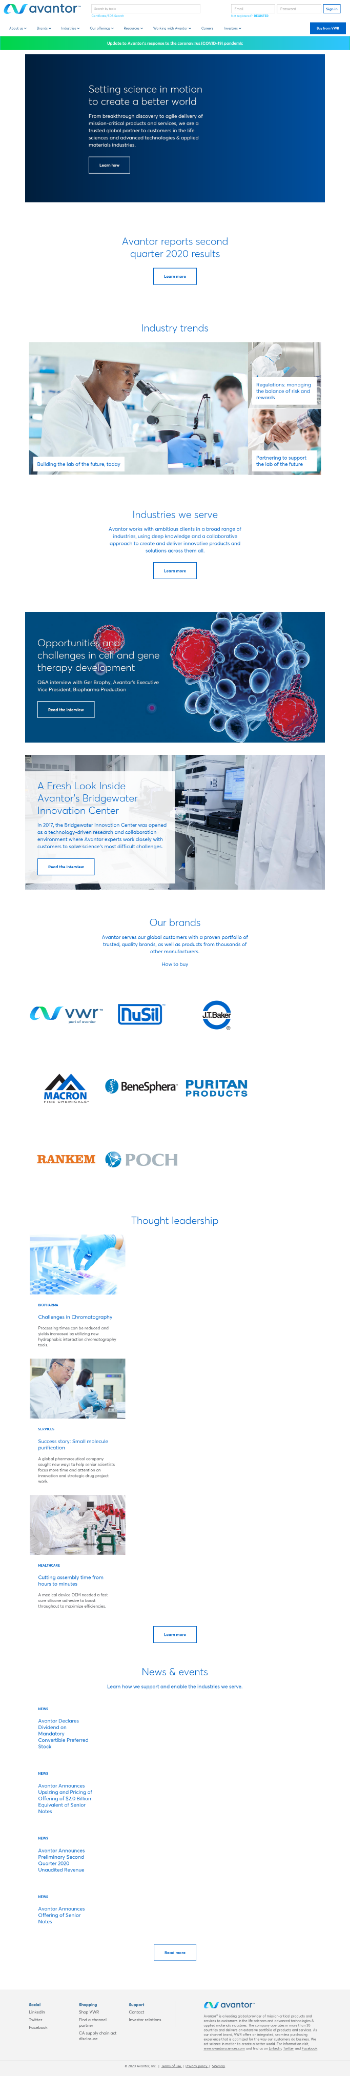 Avantor, Inc. Website Screenshot